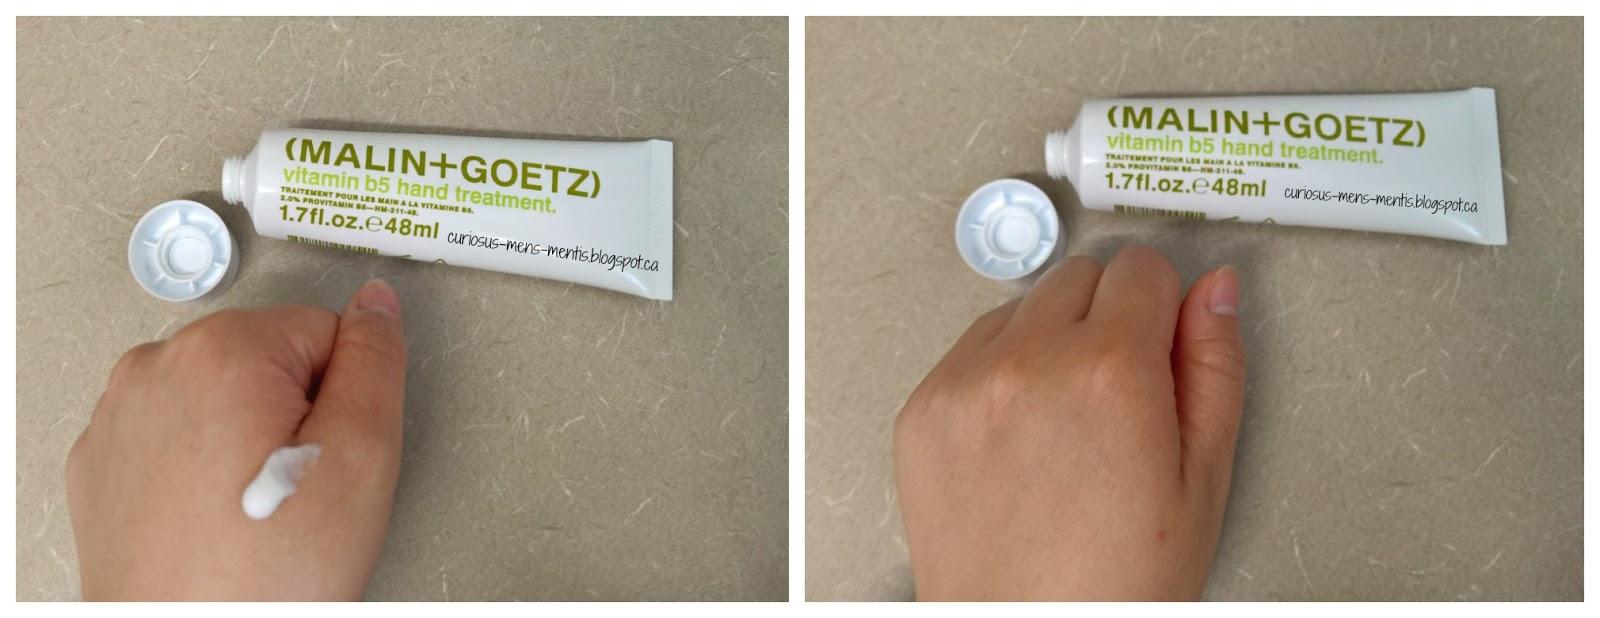 malin goetz vitamin b5 hand treatment